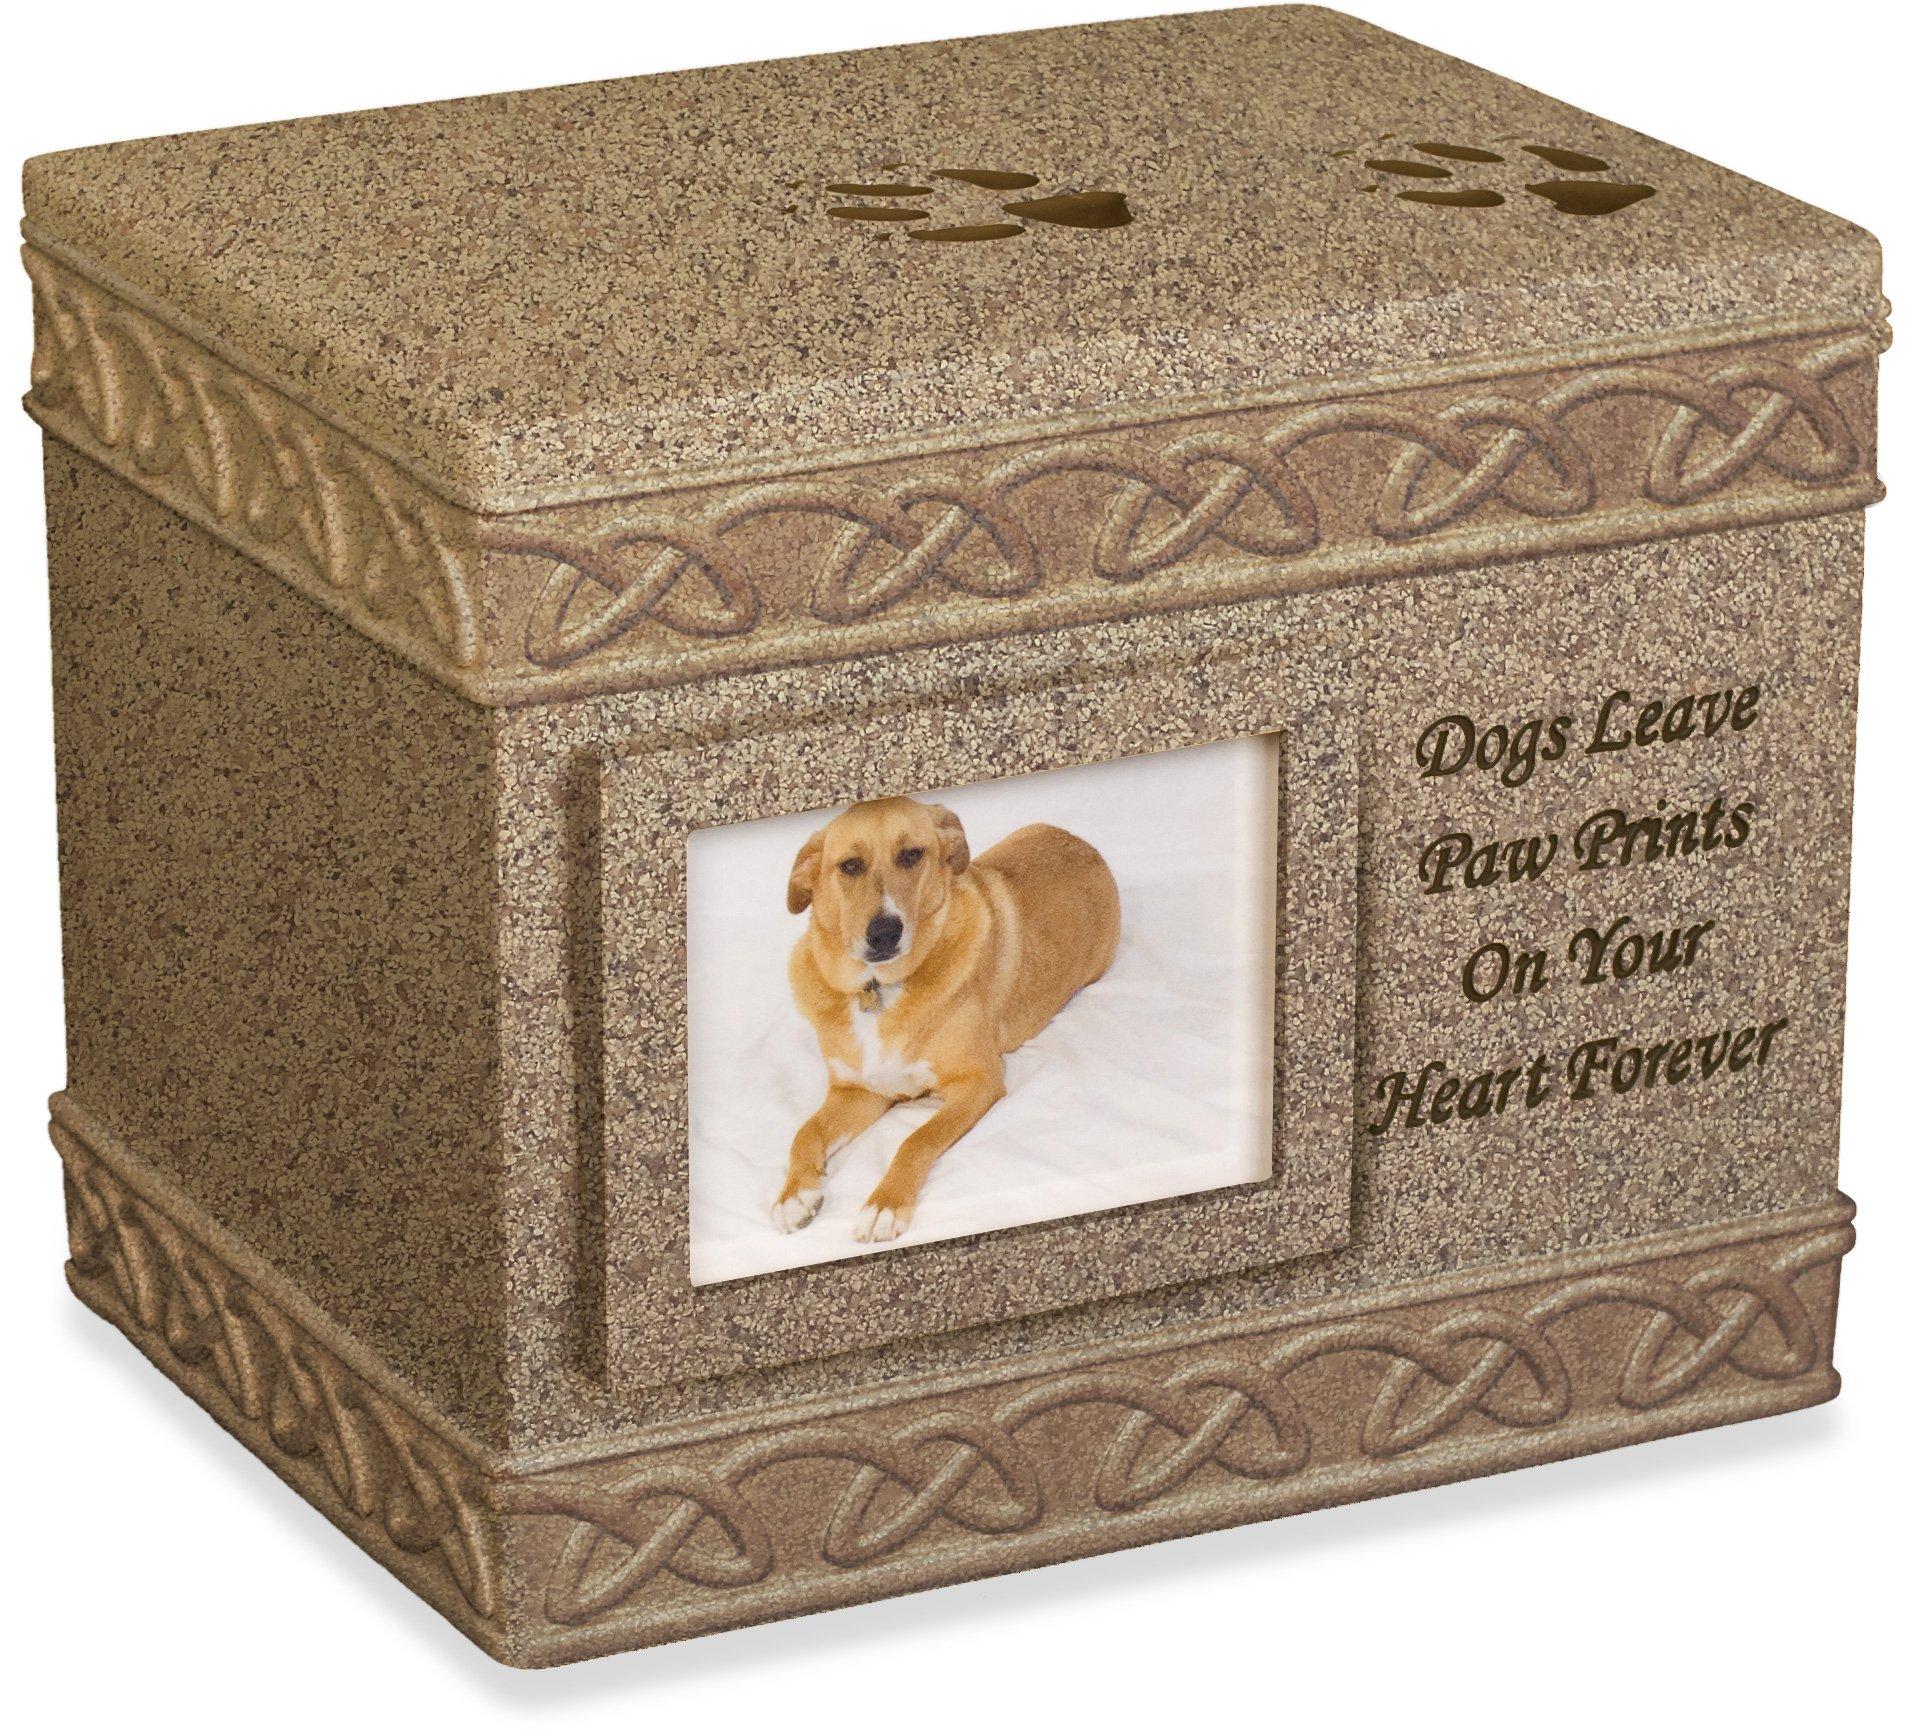 Angel Star 5-Inch Pet Urn for Dog, Dark Brown by AngelStar